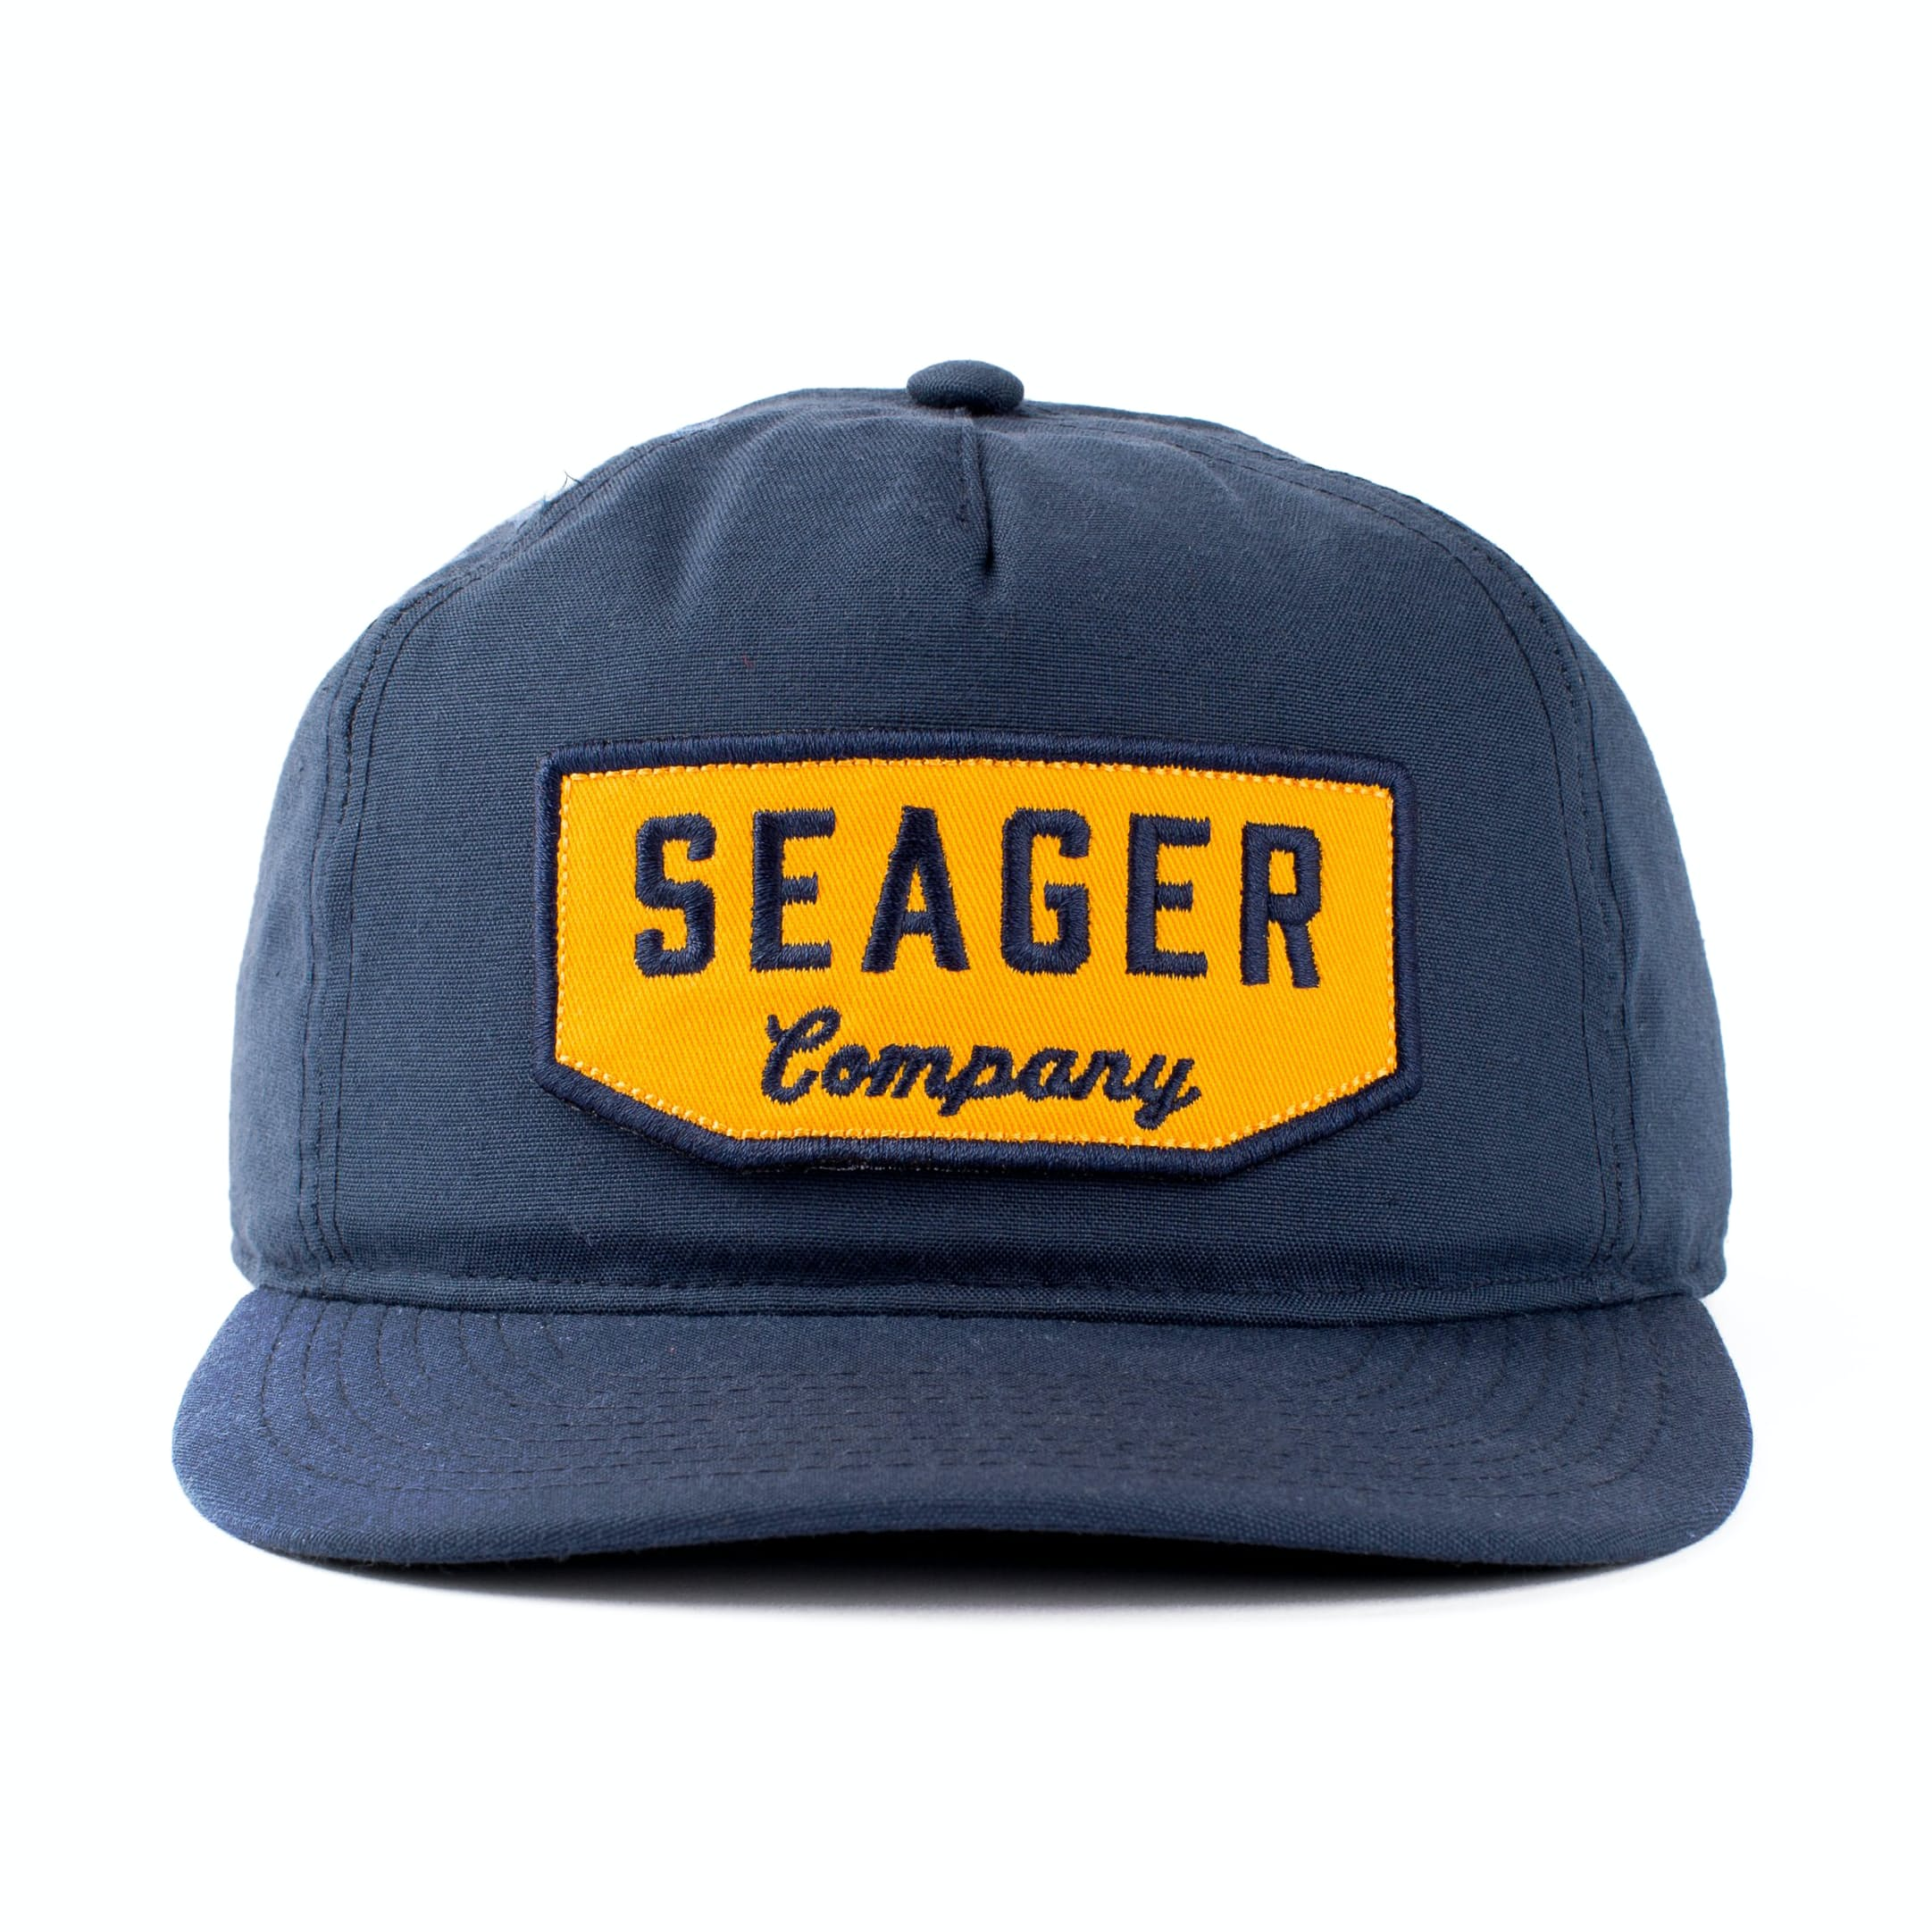 2xgepi7gqg seager co wilson snapback 0 original